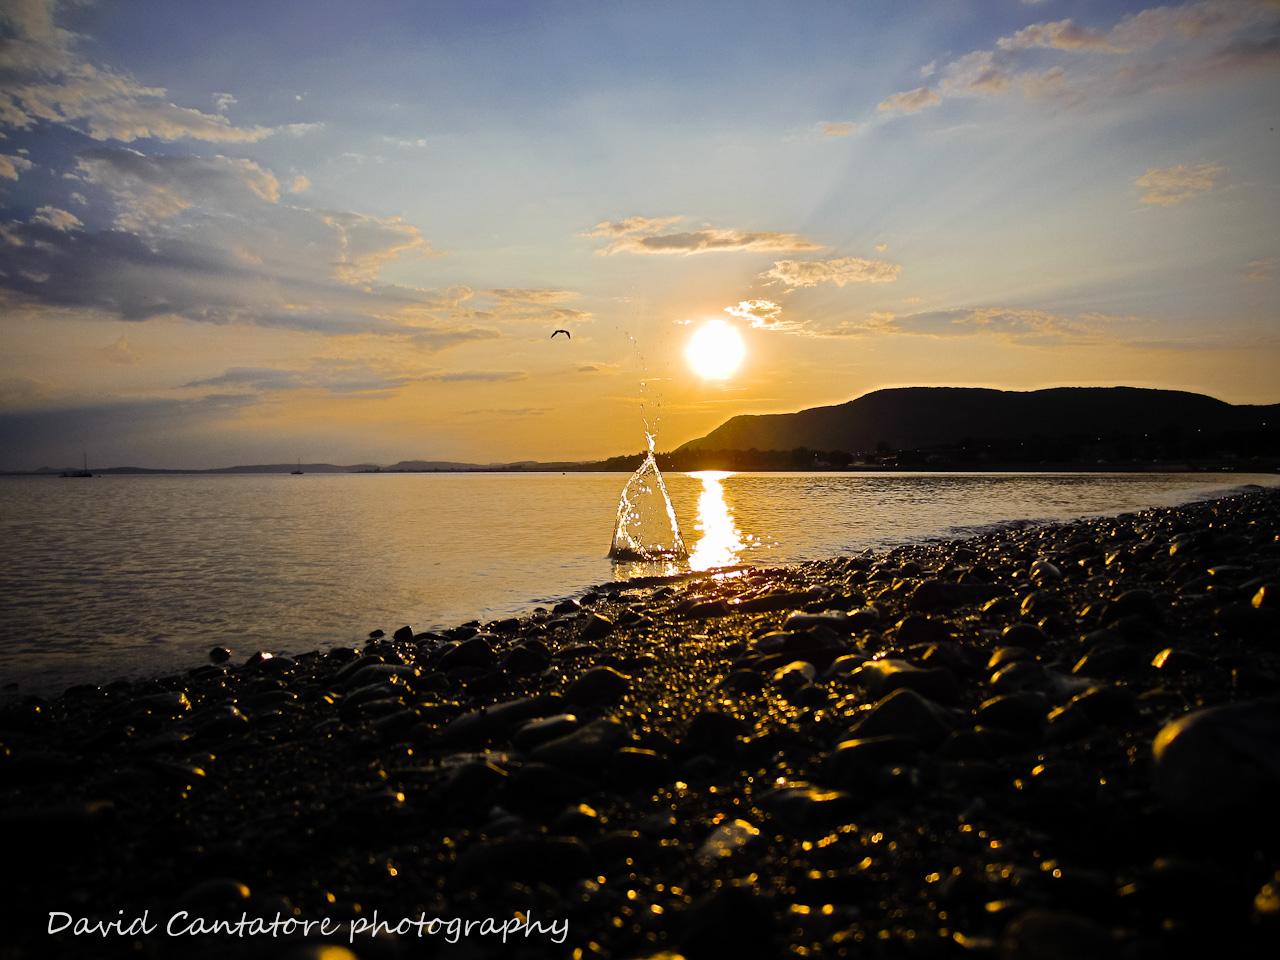 A splash of sunset